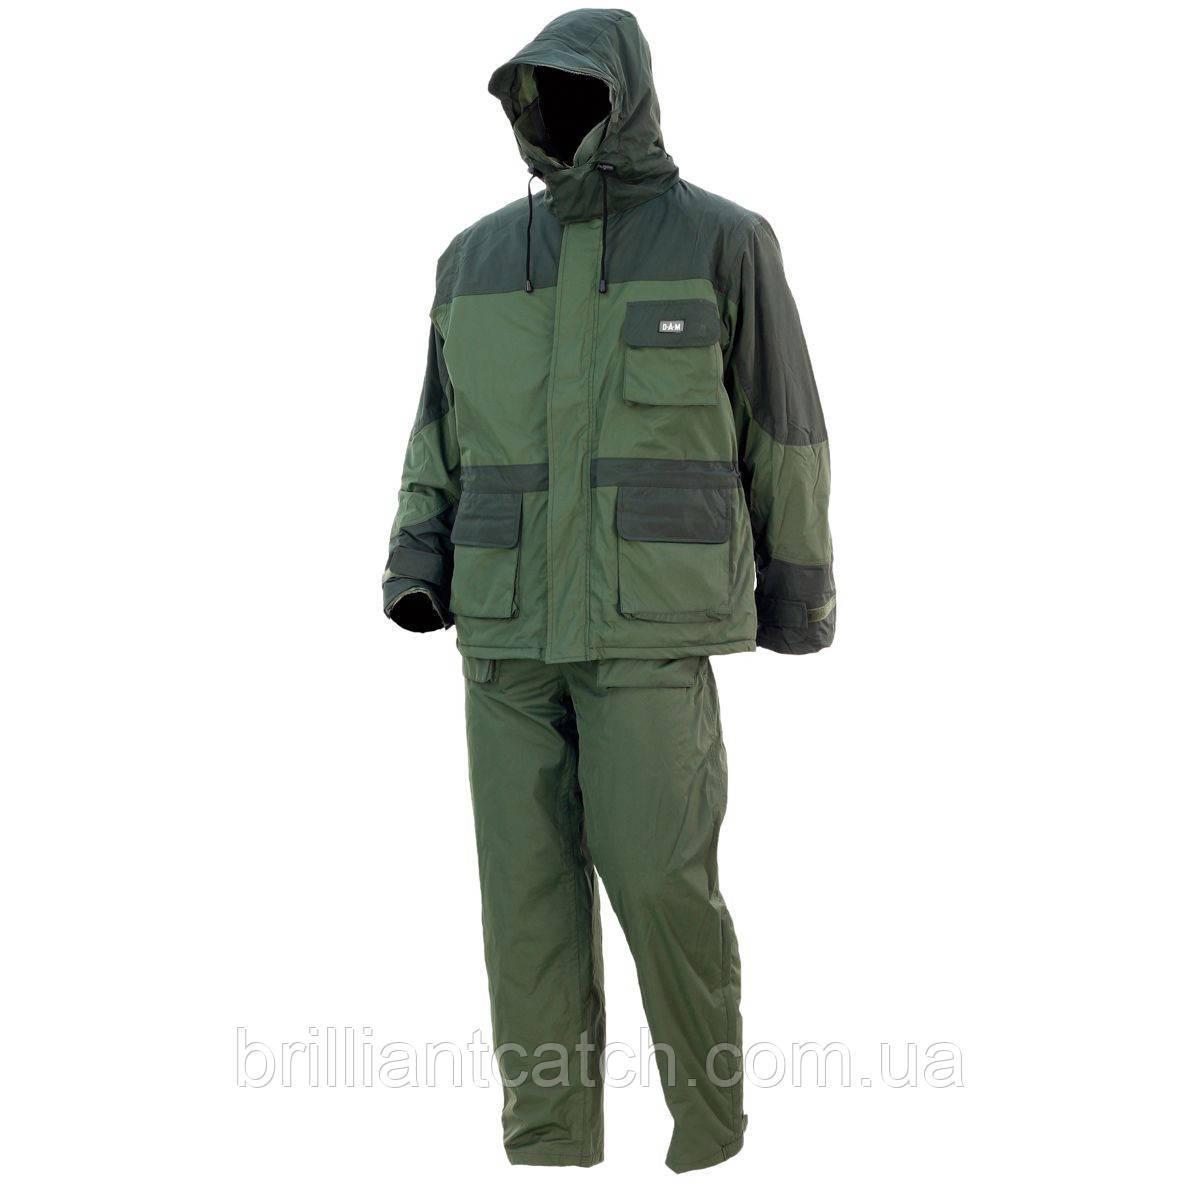 Костюм зимний DAM Thermo куртка+полукомбинезон  XXL